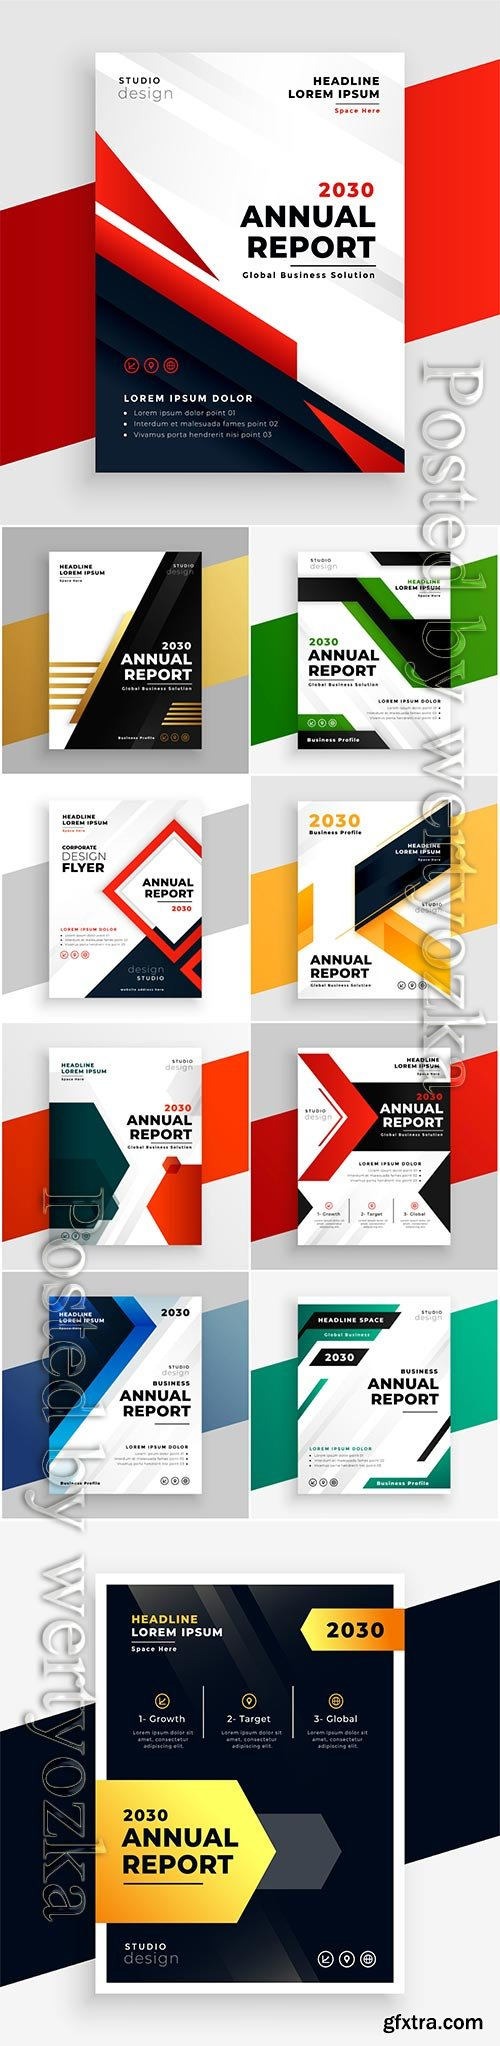 Business brochures in modern style, vector illustration